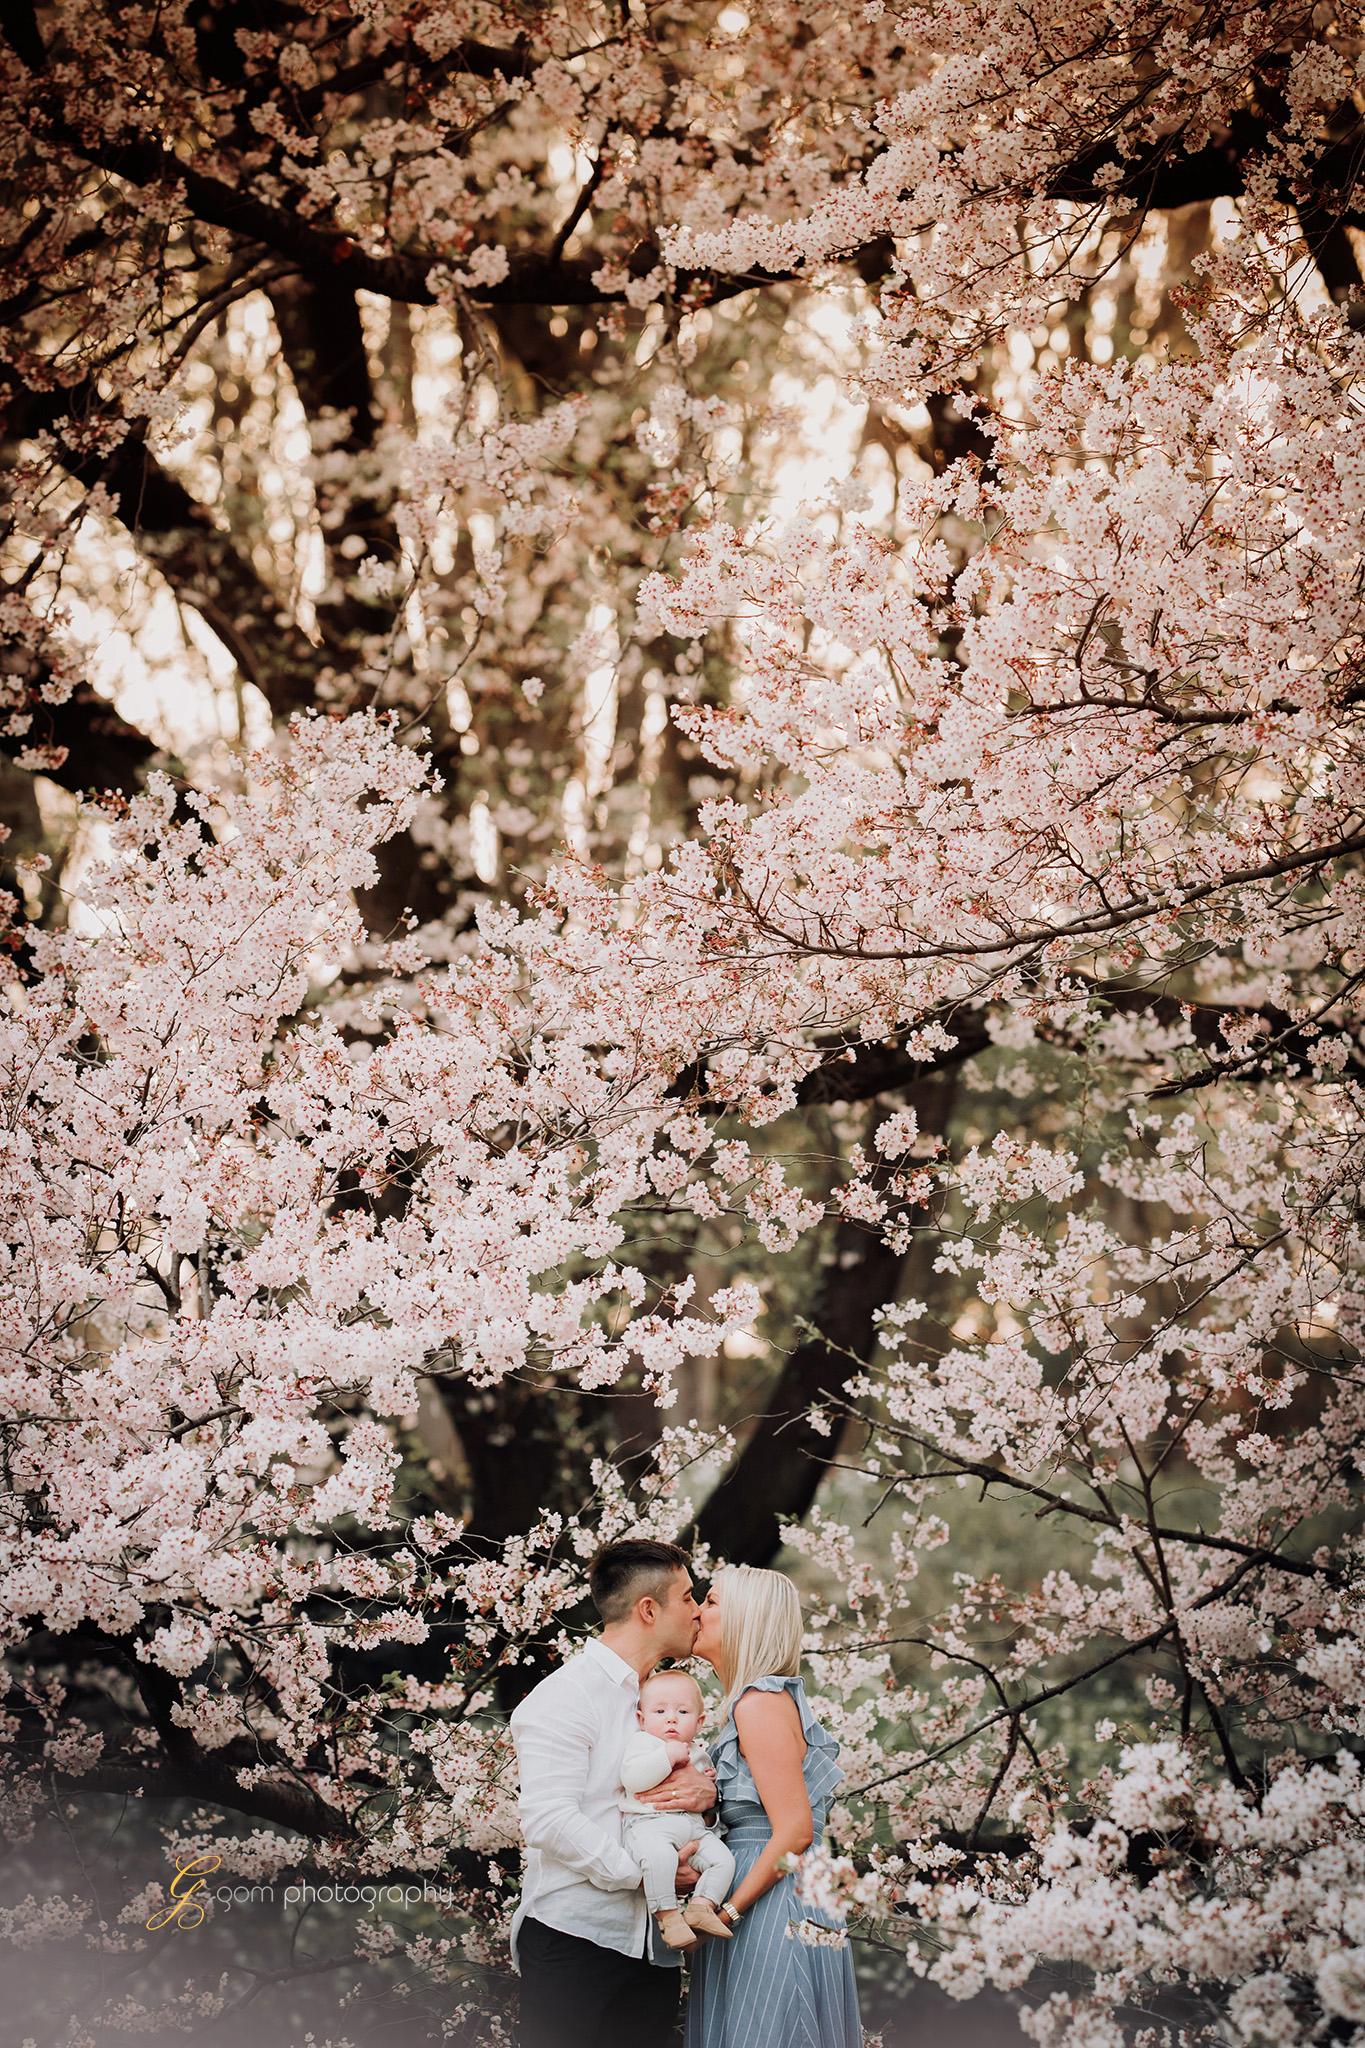 tokyo_photographer_cherry_blossom2